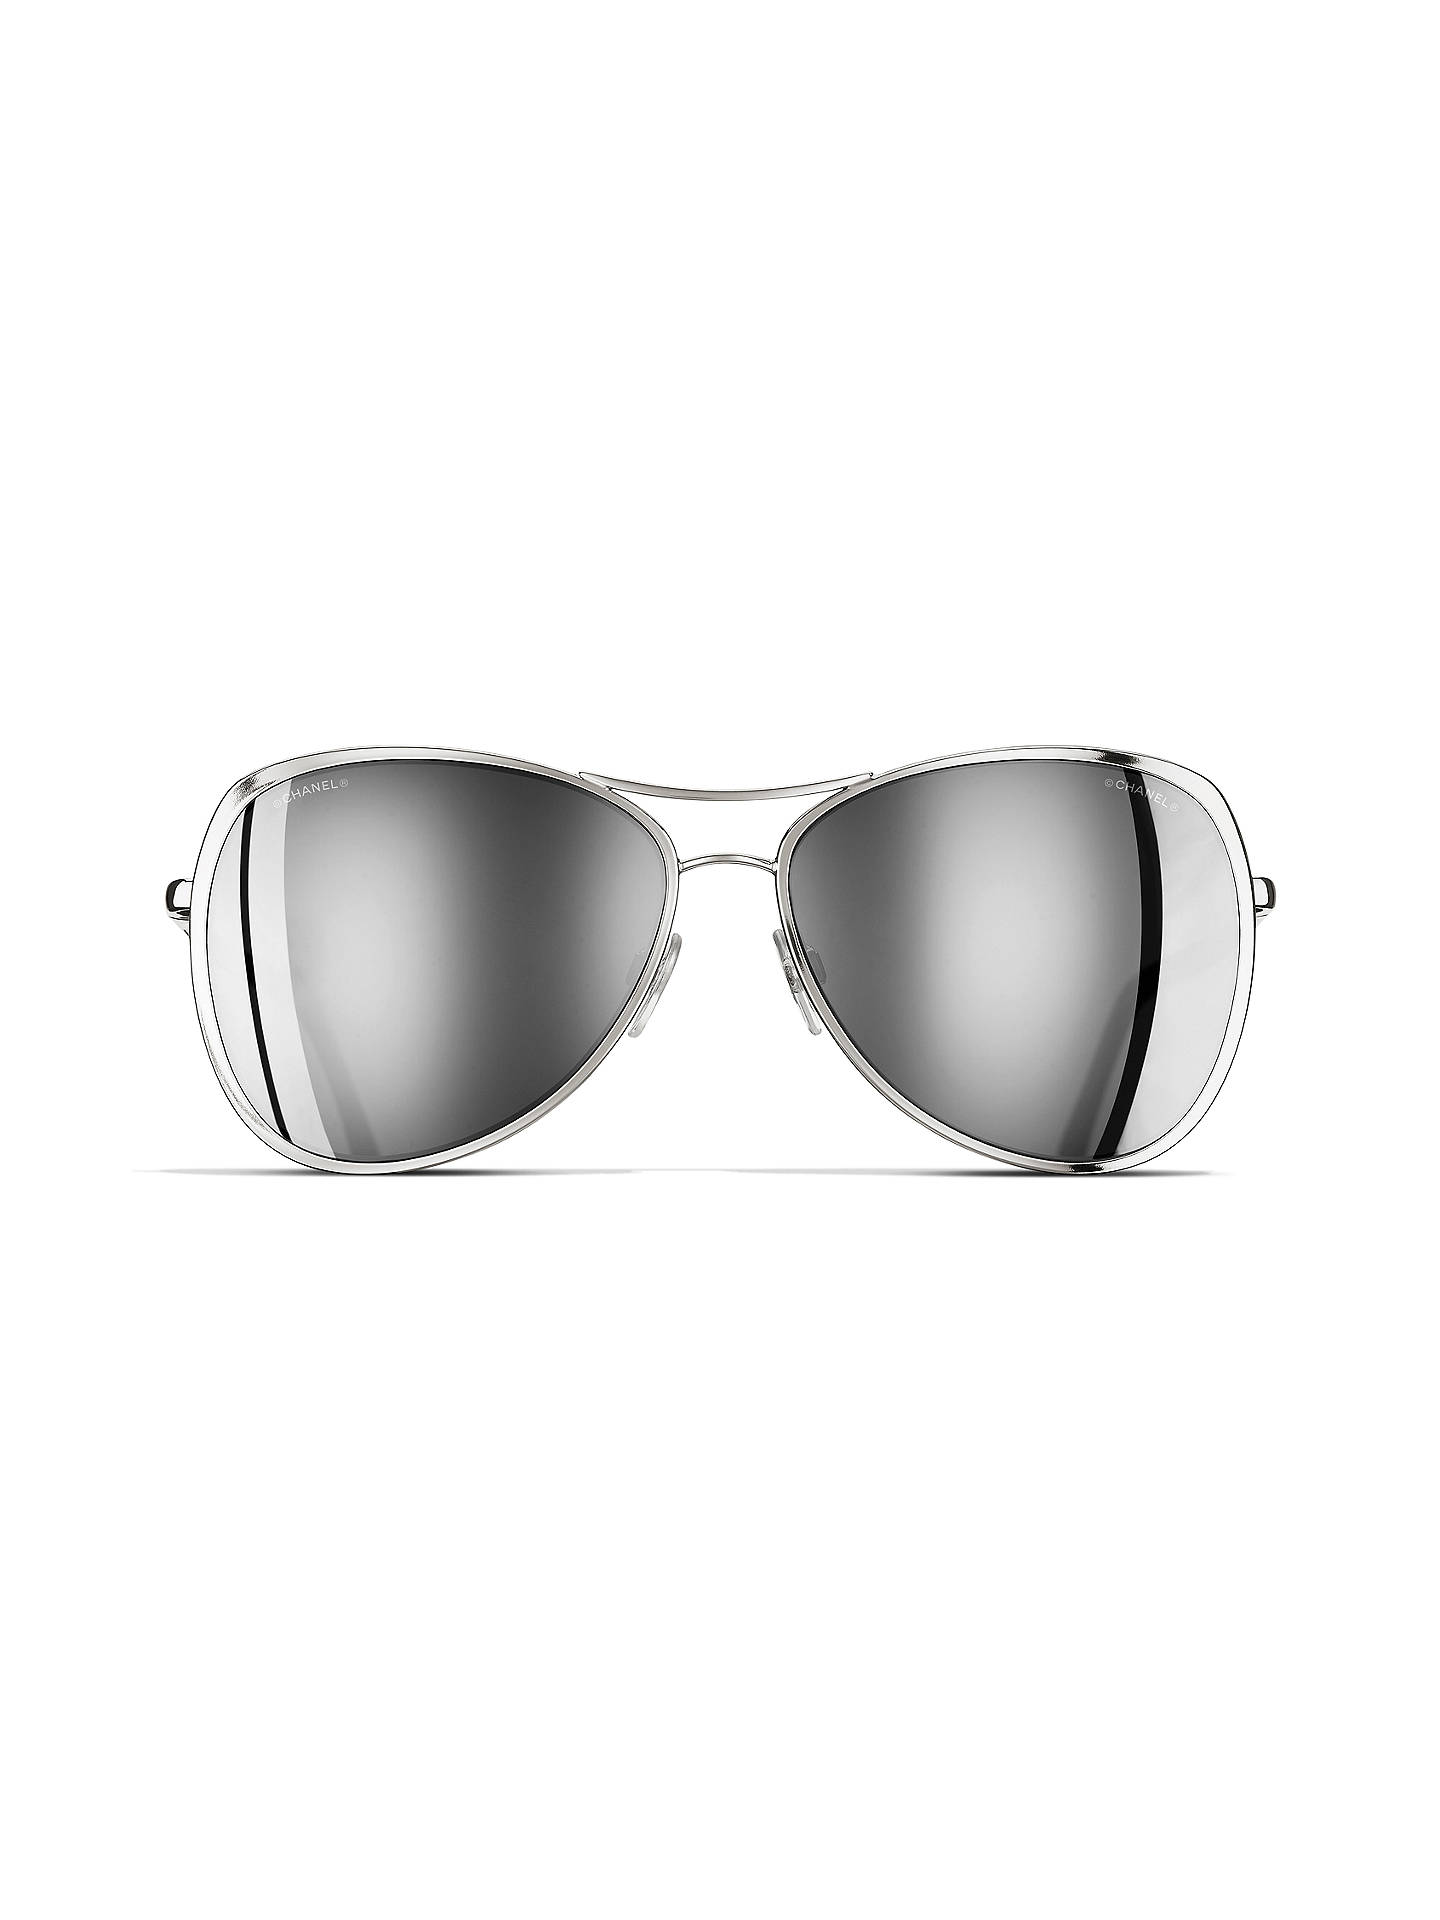 a444b8491d ... BuyCHANEL Pilot Sunglasses CH4223 Silver Online at johnlewis.com ...